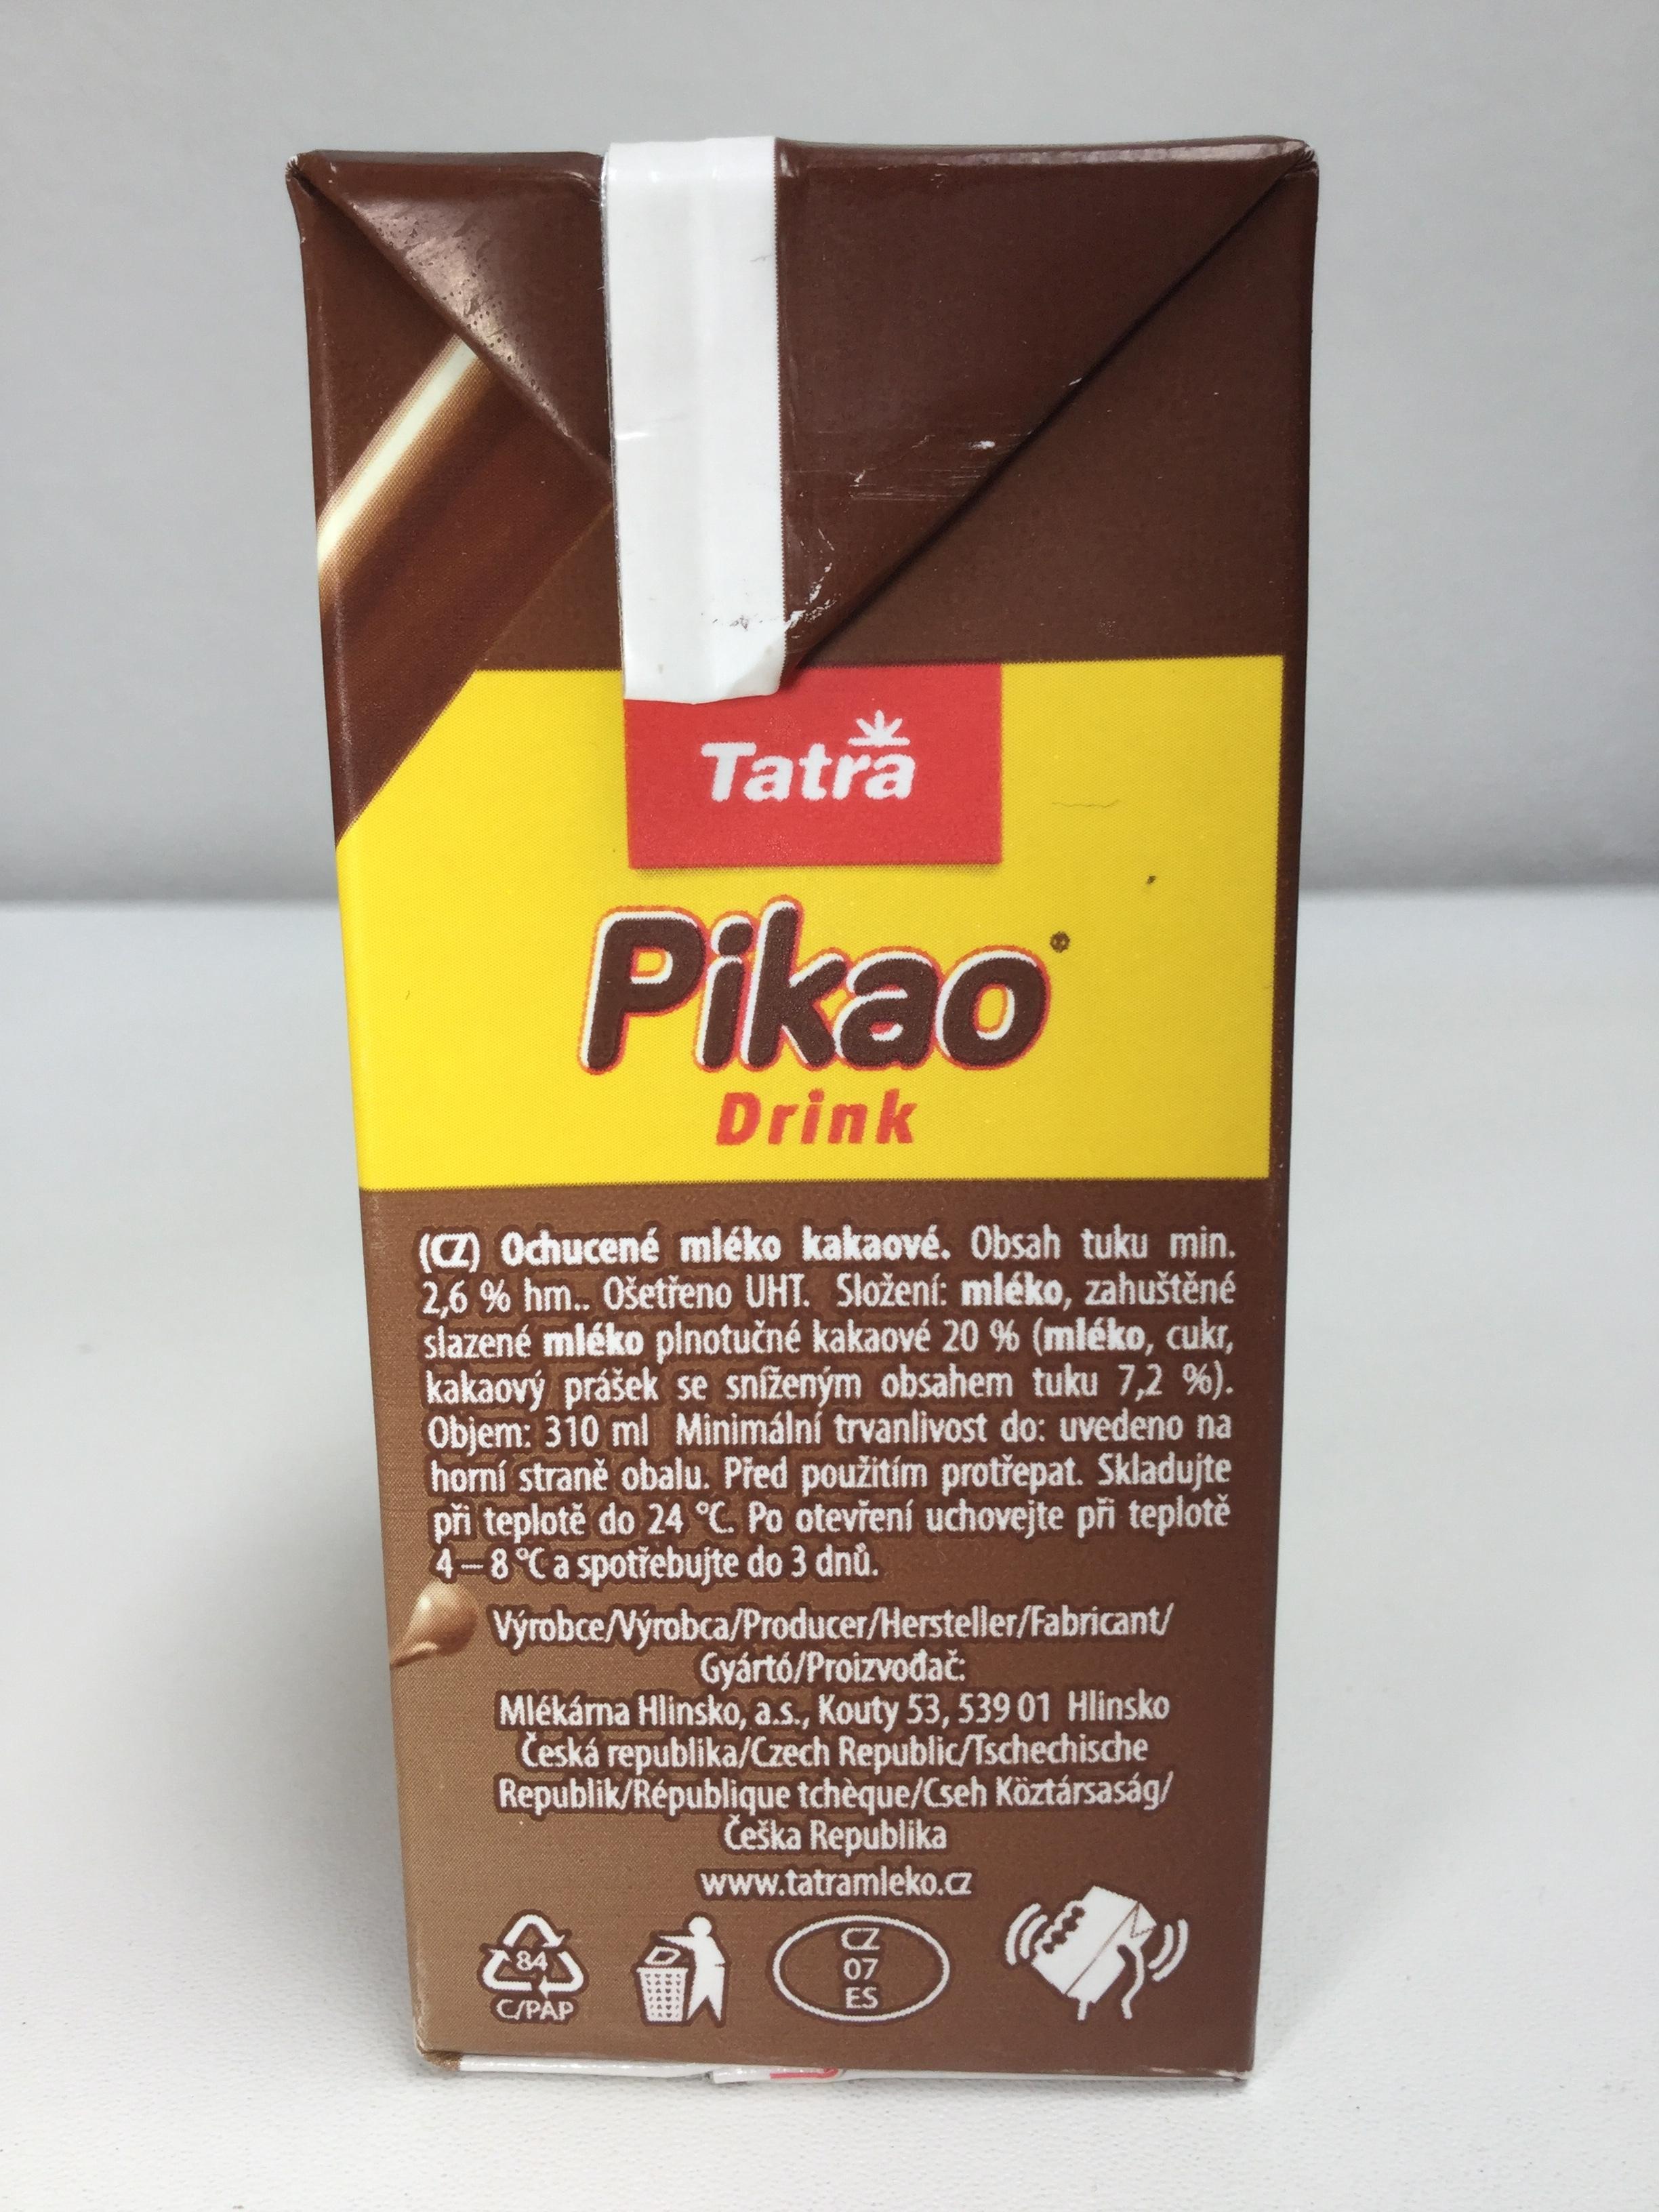 Tatra Pikao Drink Side 2